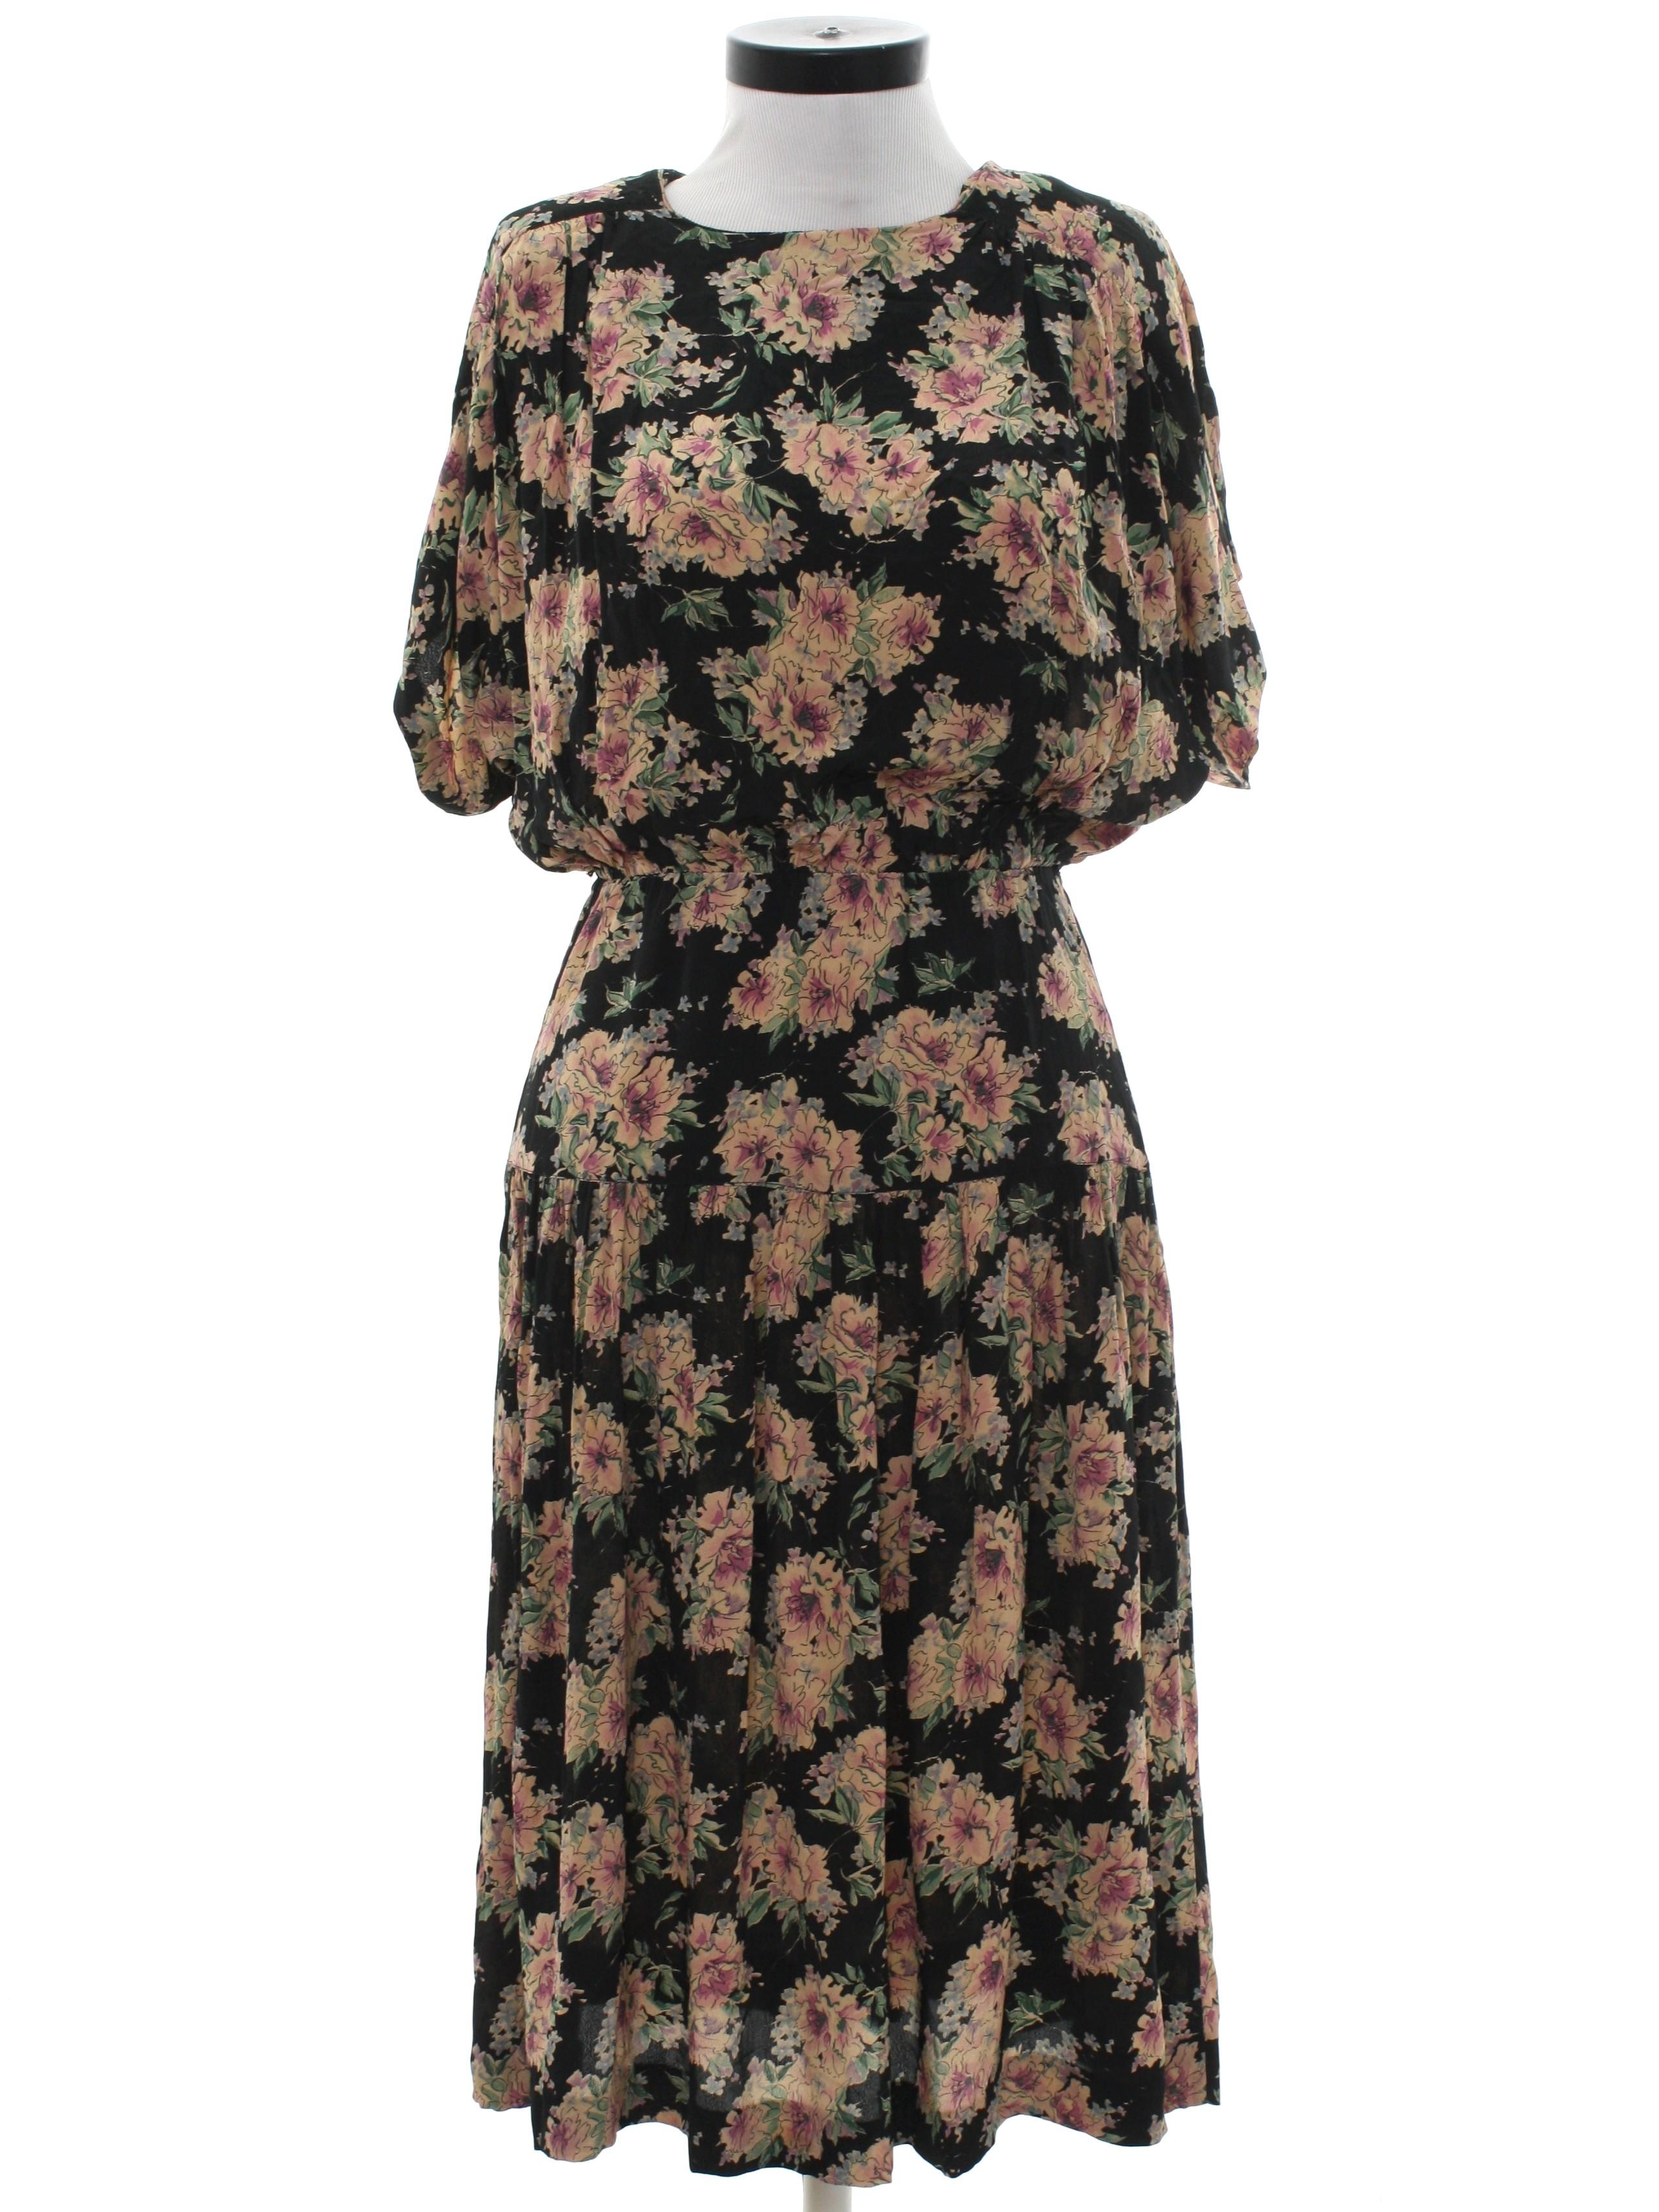 ac19607d5e27 Retro 80s Dress (Michelle Stuart Petite)   80s -Michelle Stuart Petite-  Womens black background silky rayon short sleeve mid length totally 80s  dress.